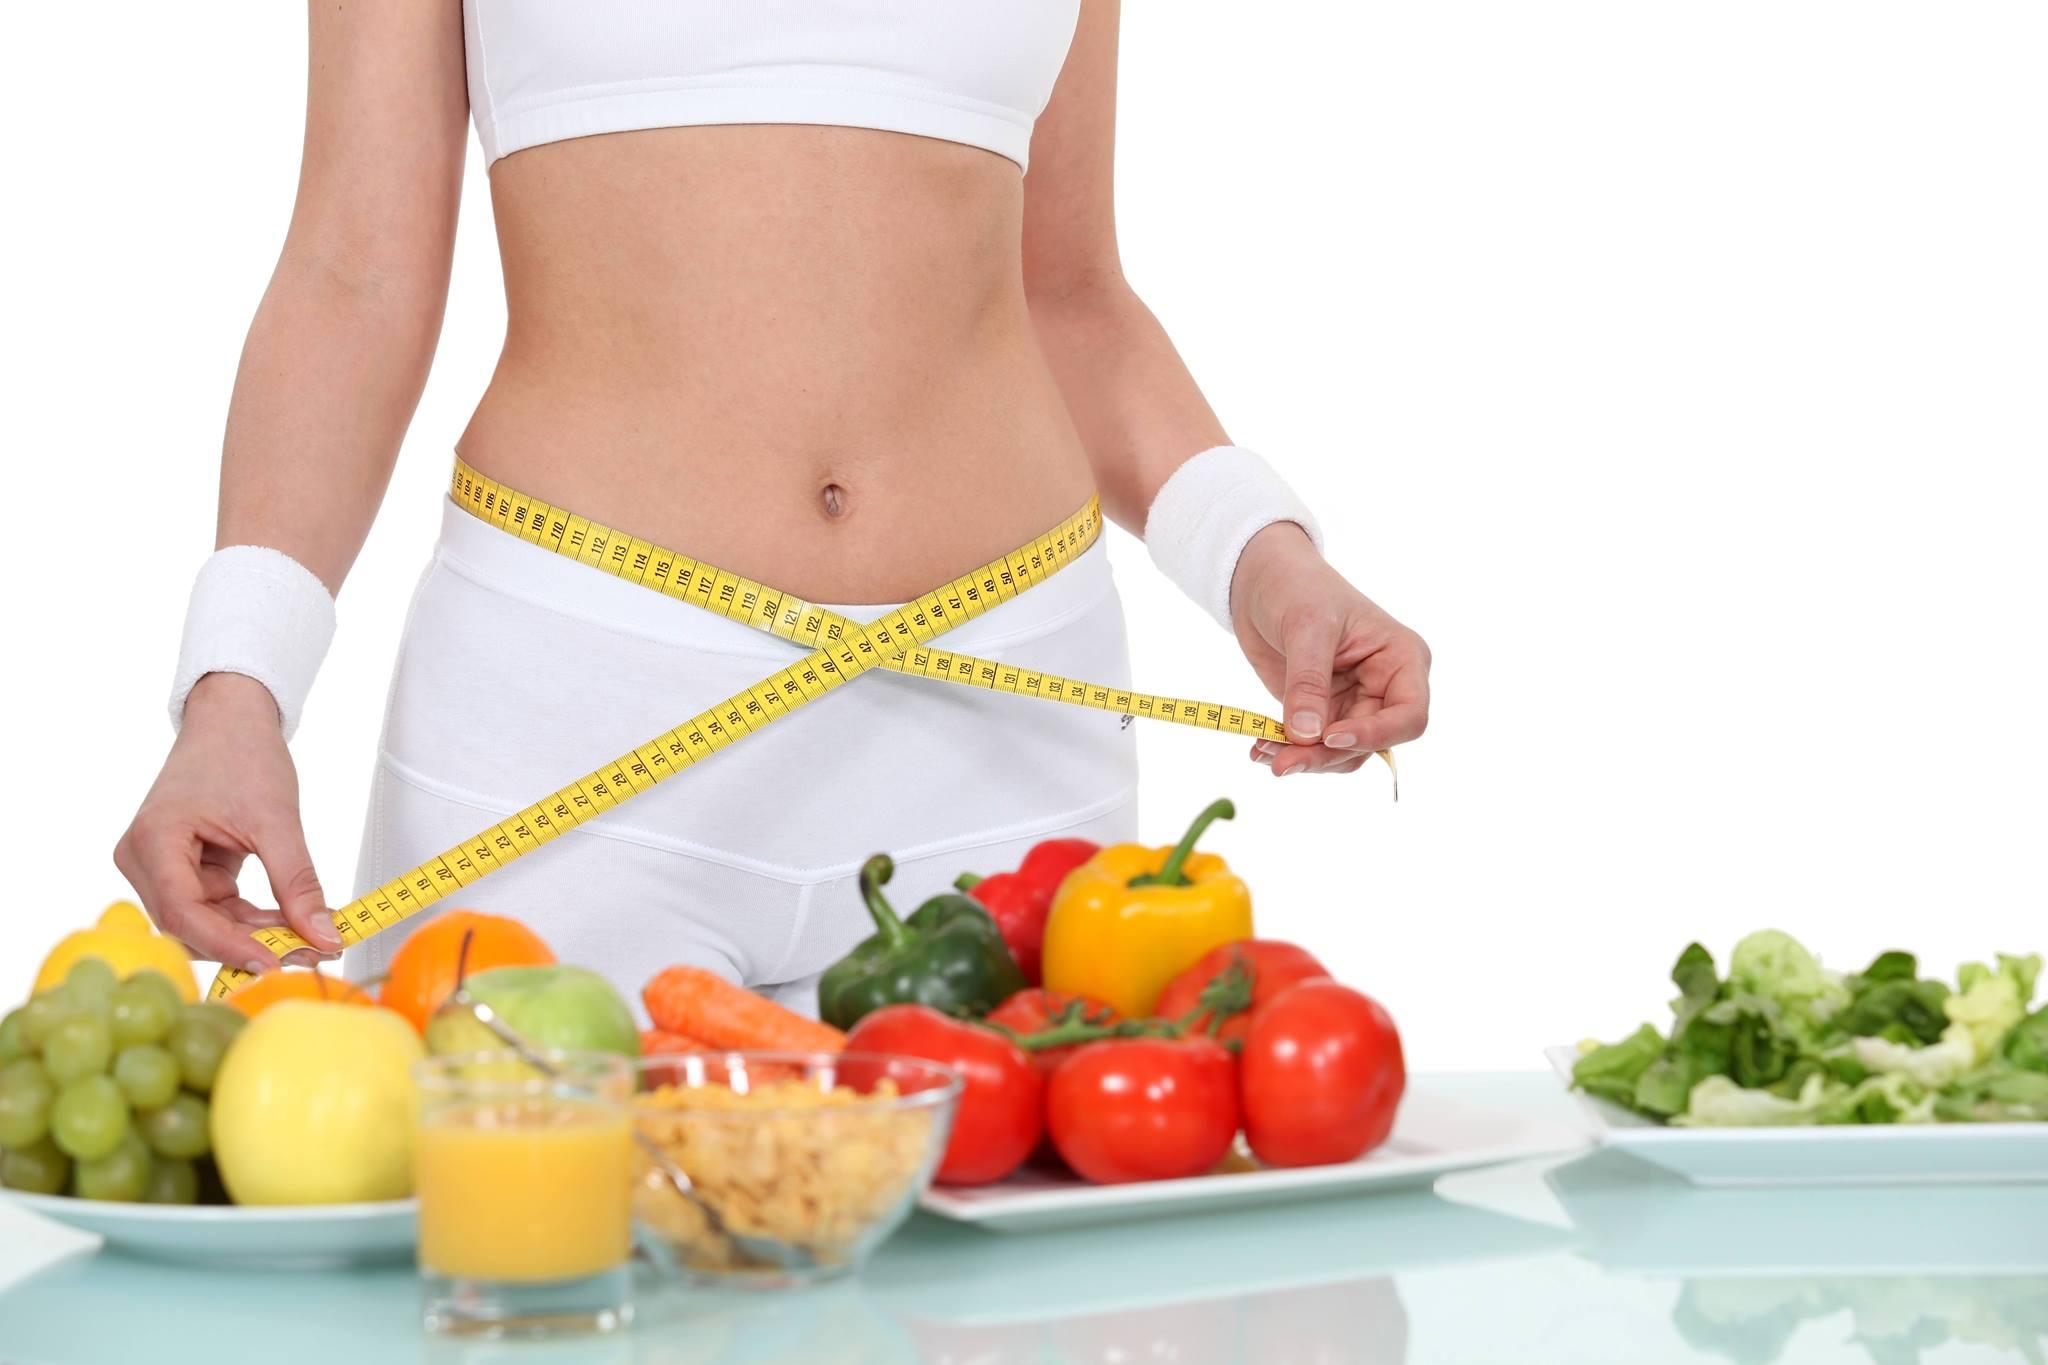 dieta ipocalorica 1200 calorie